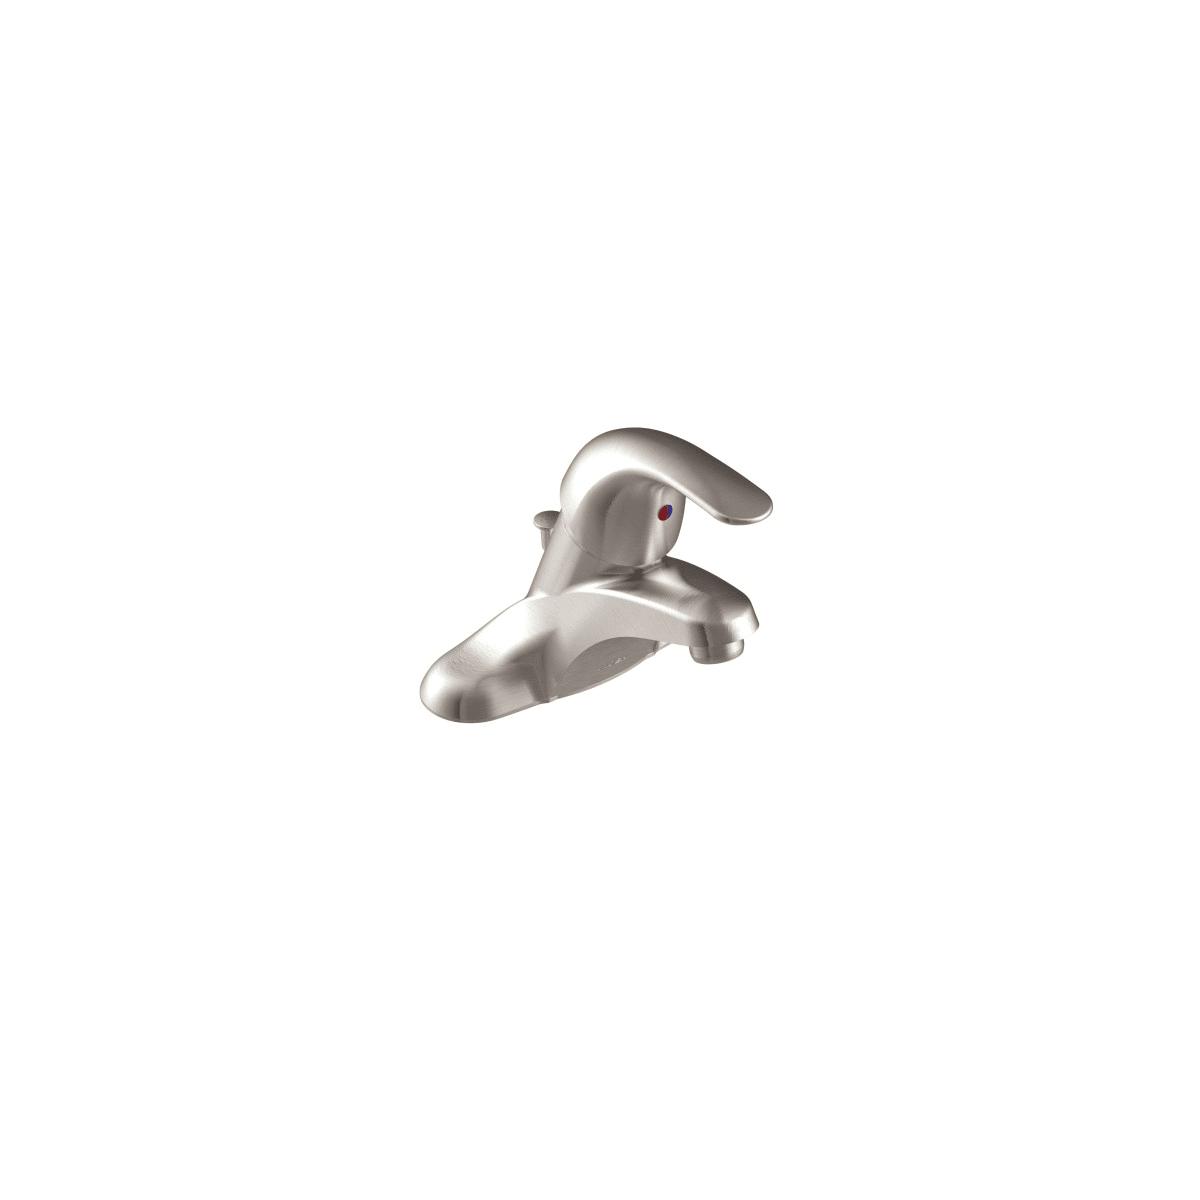 Moen Wsl84502srn Spot Resist Brushed Nickel Adler 1 2 Gpm